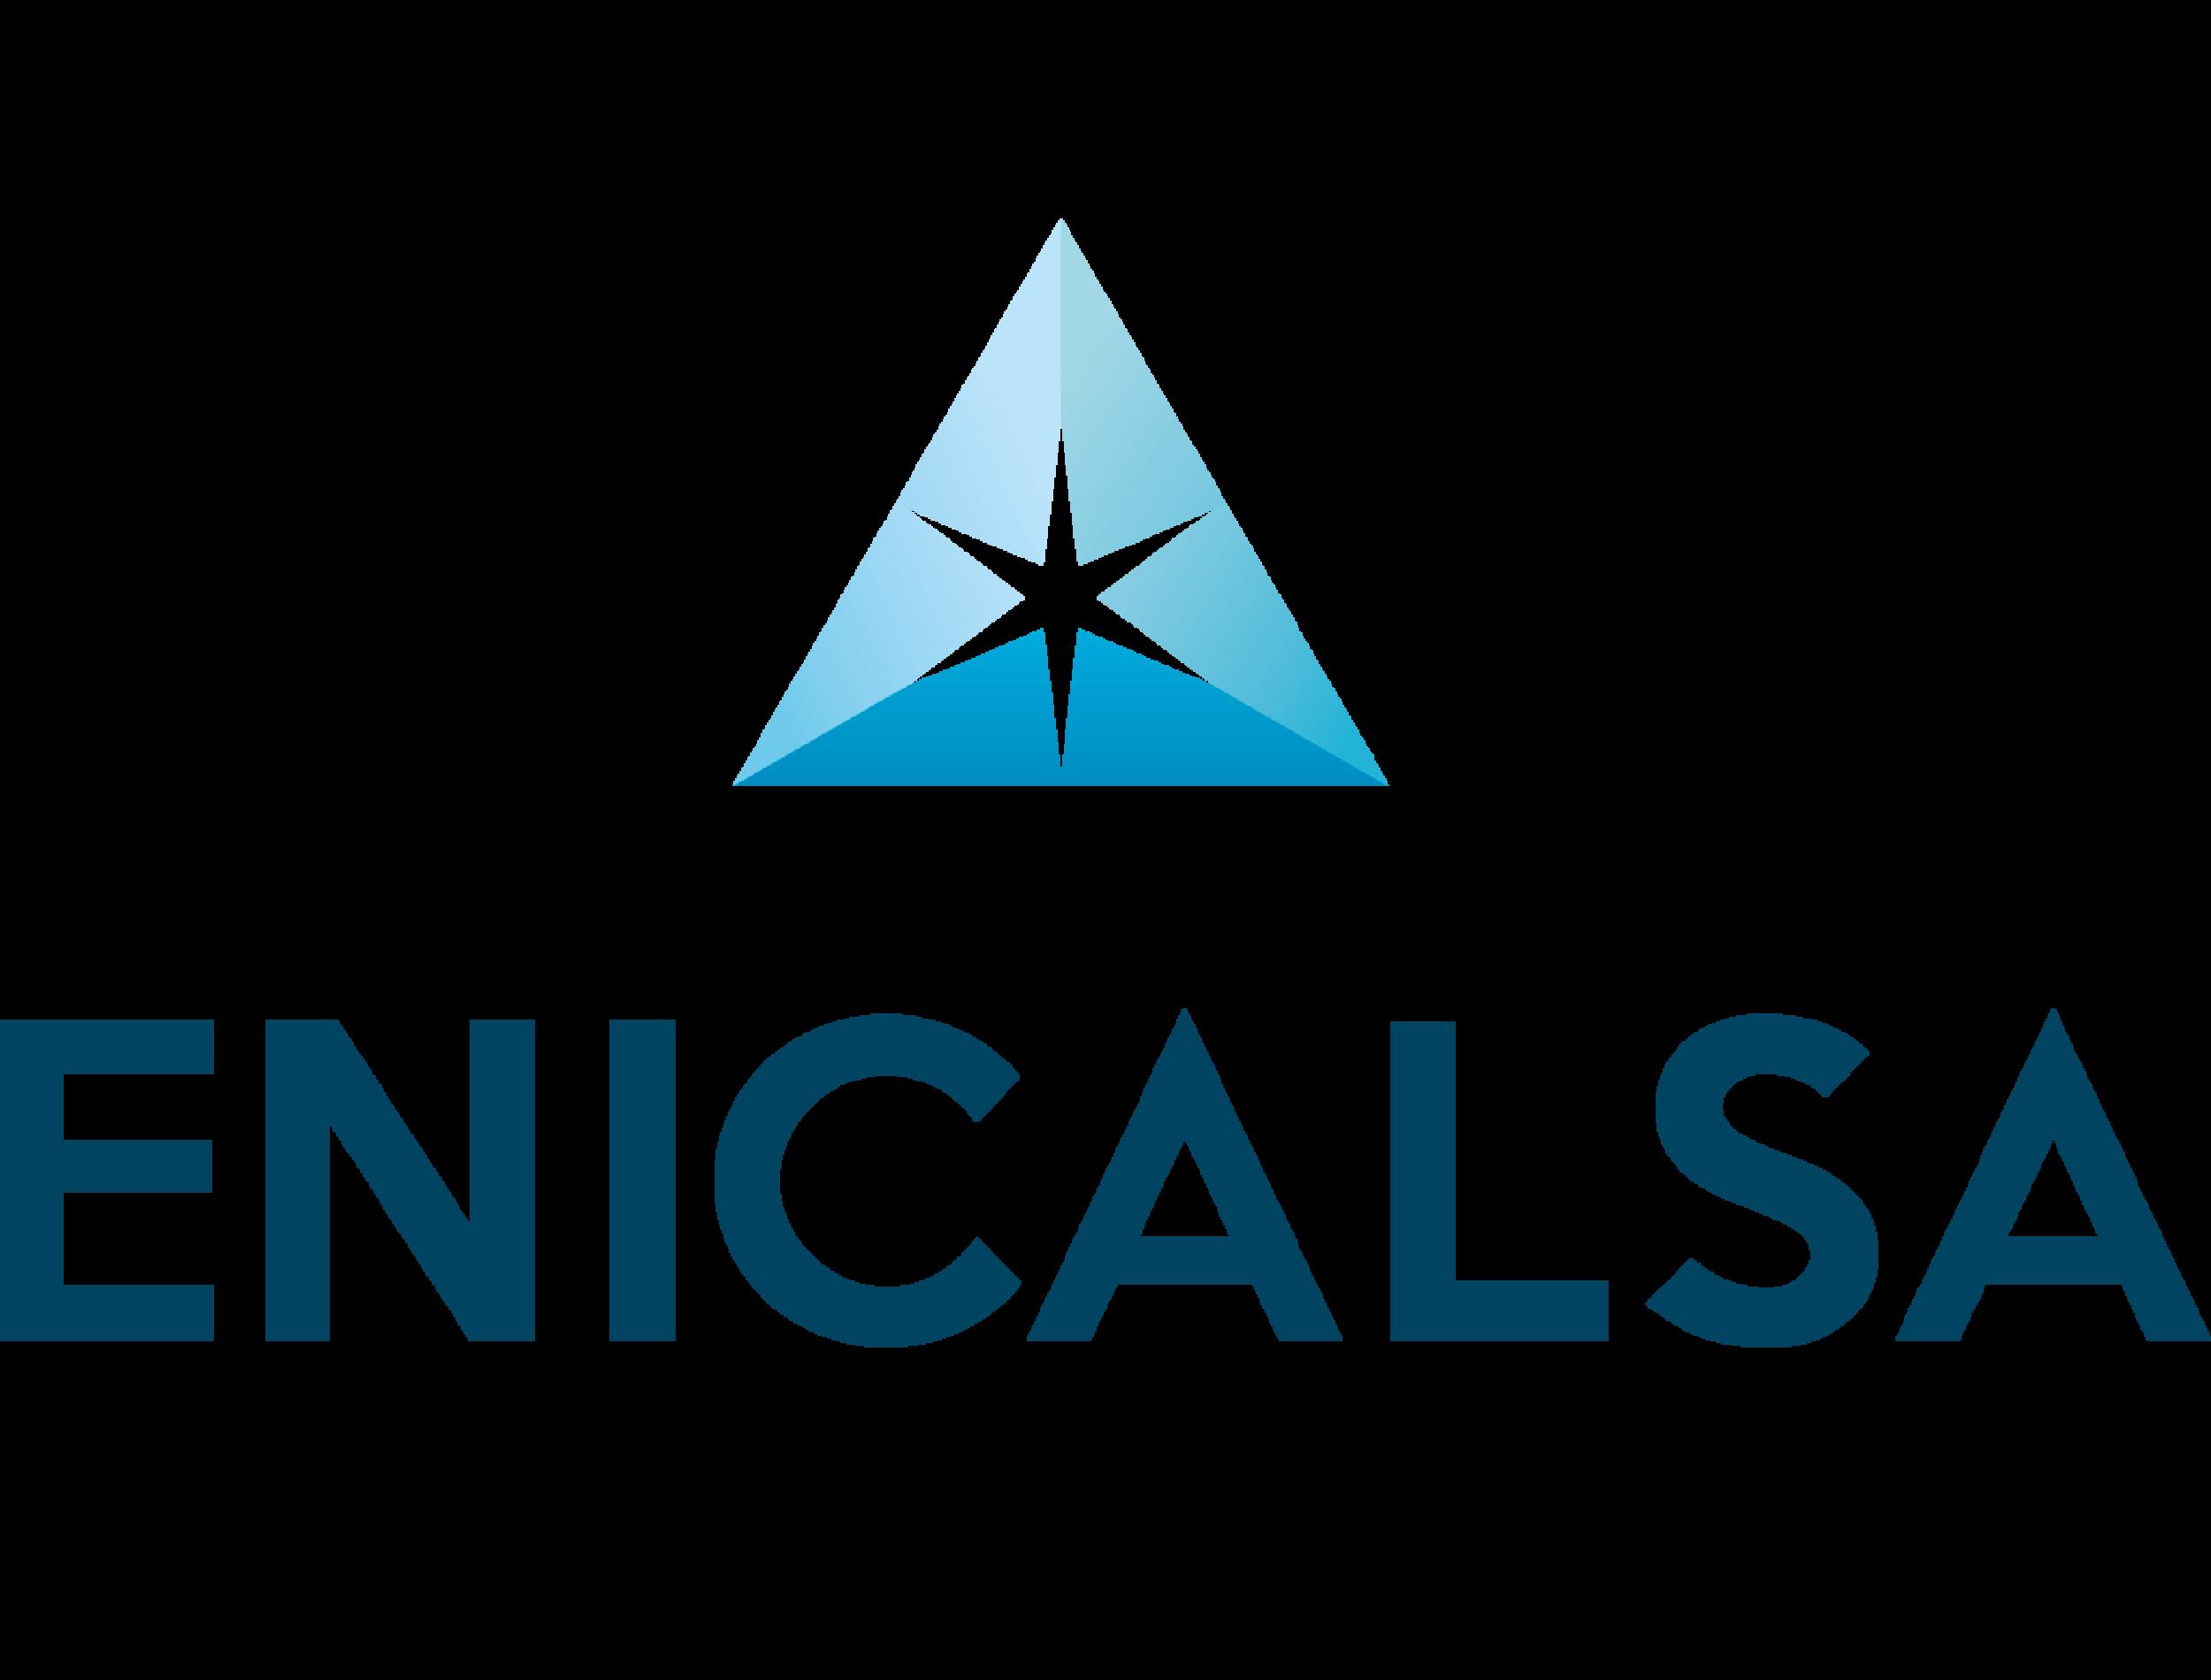 ENICALSA -